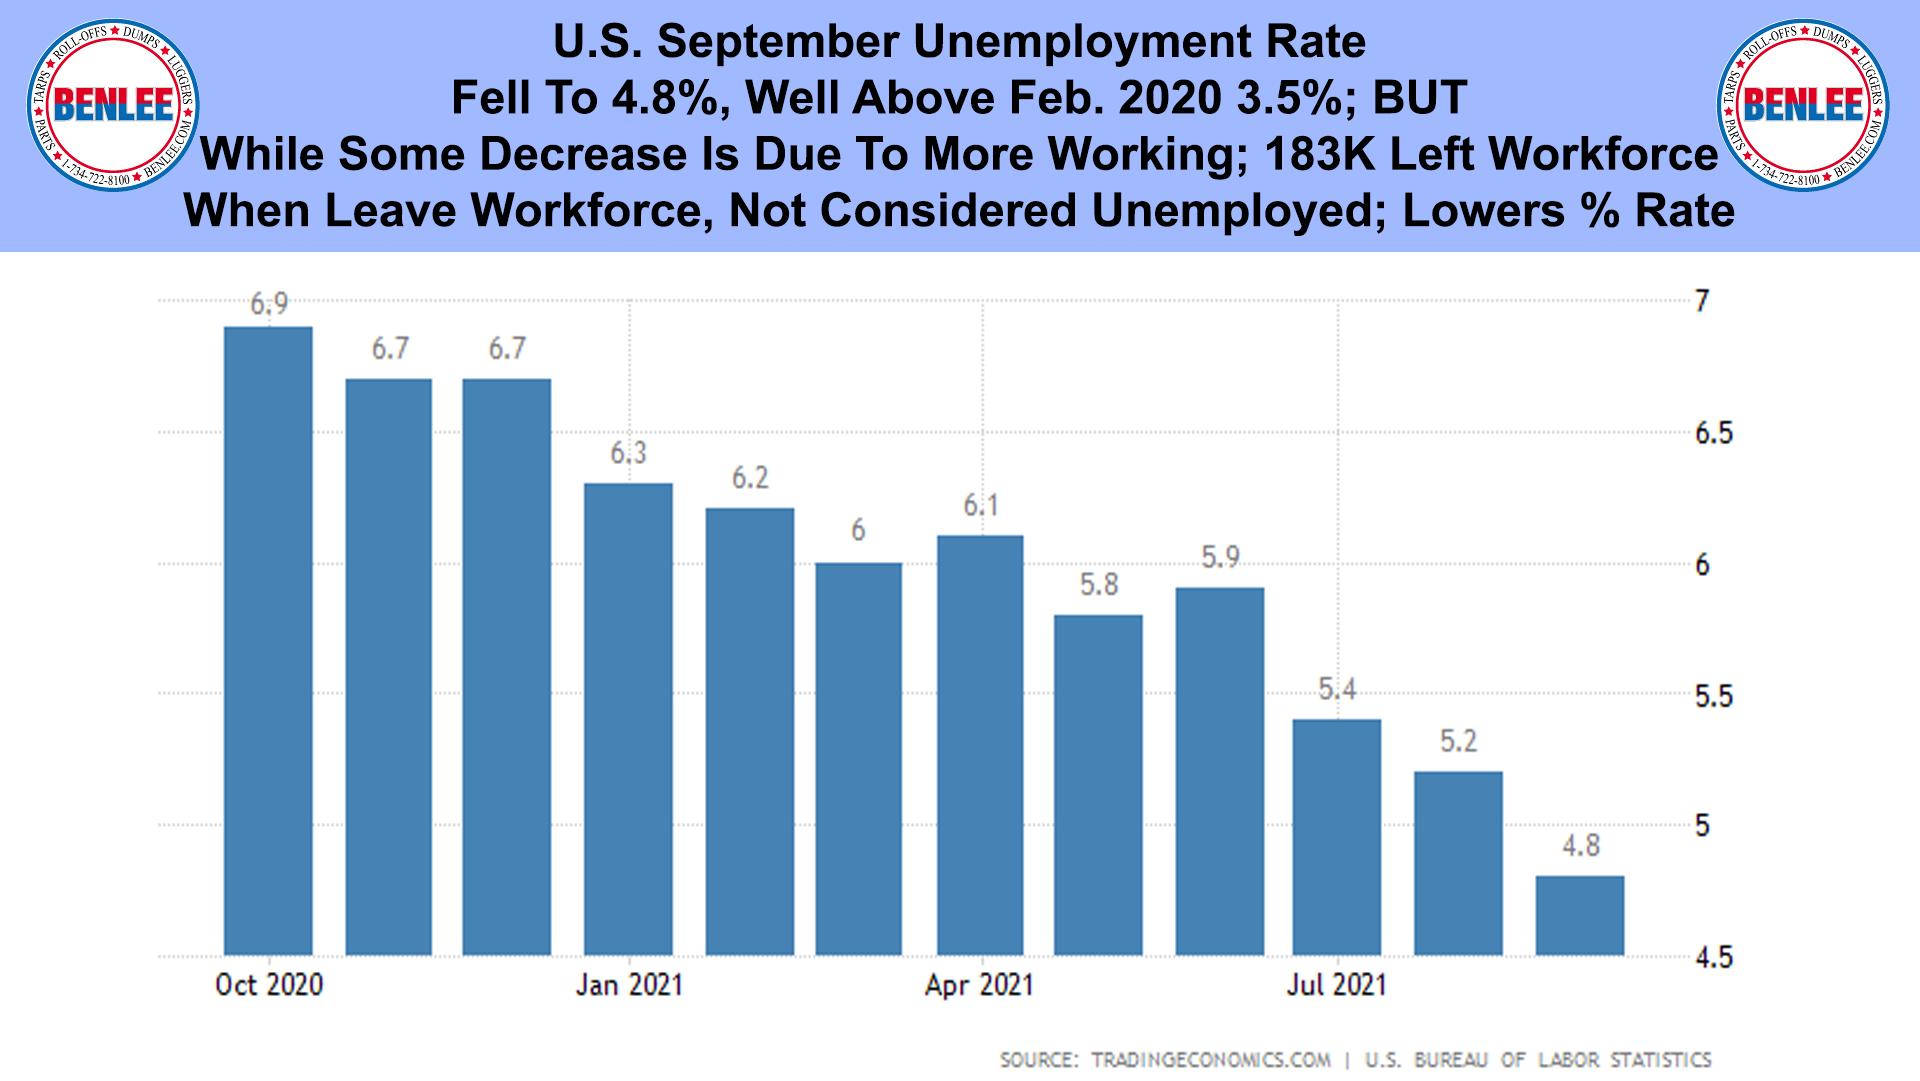 U.S. September Unemployment Rate